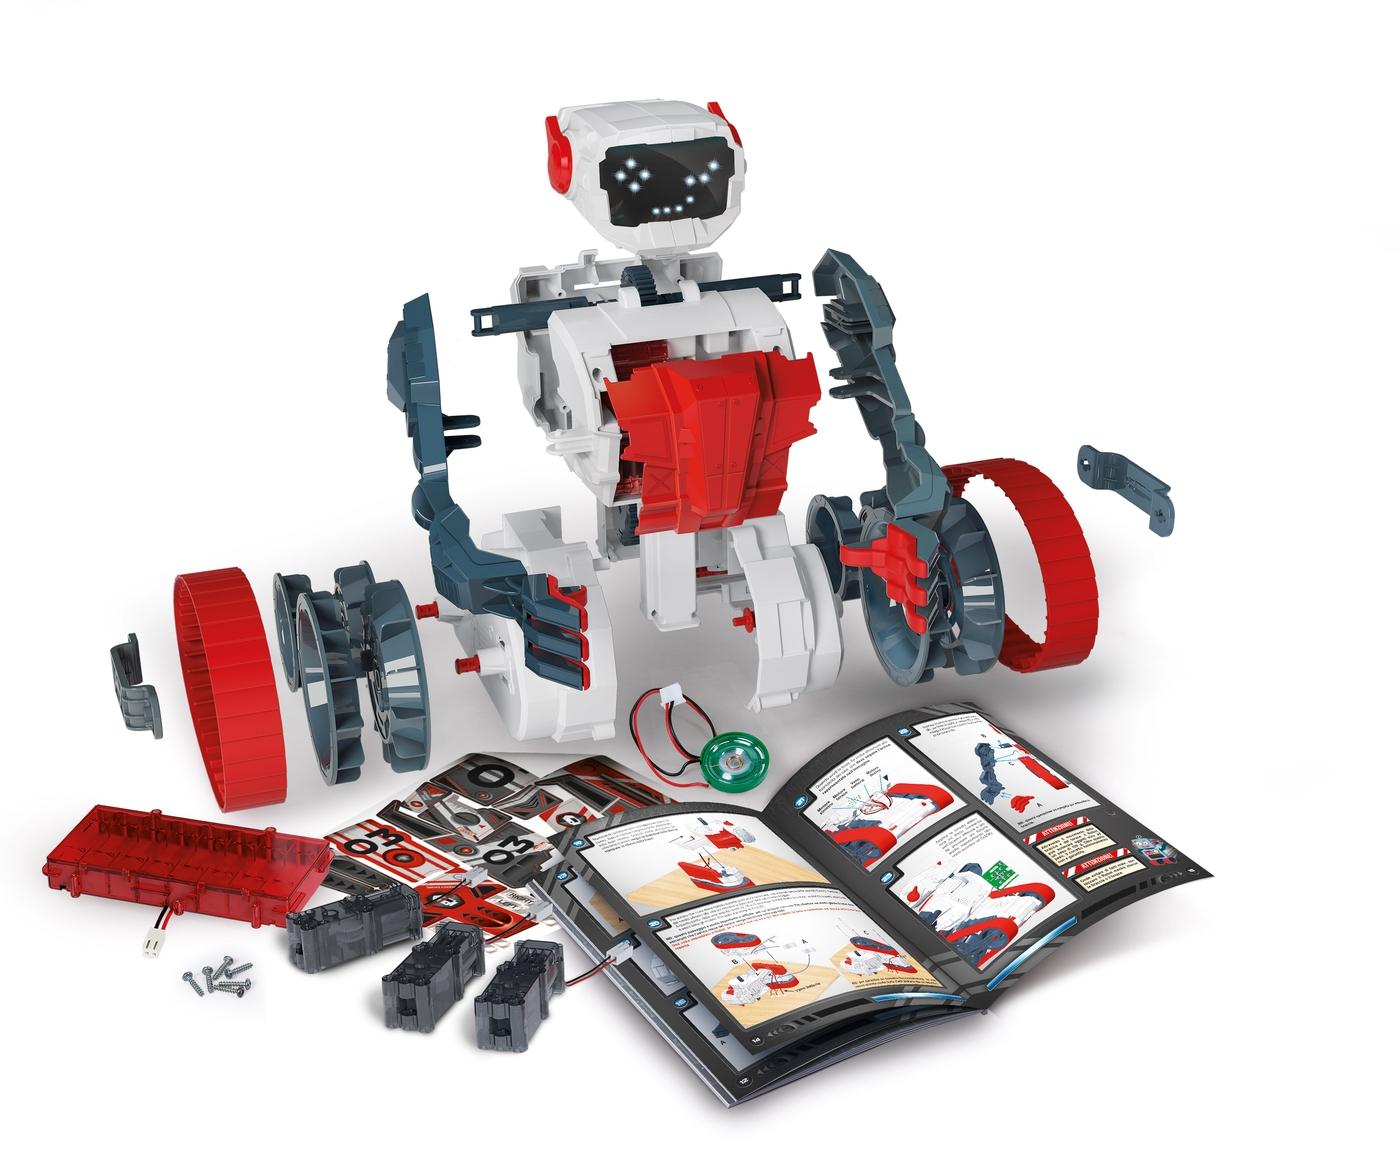 Robot Evolution Clementoni